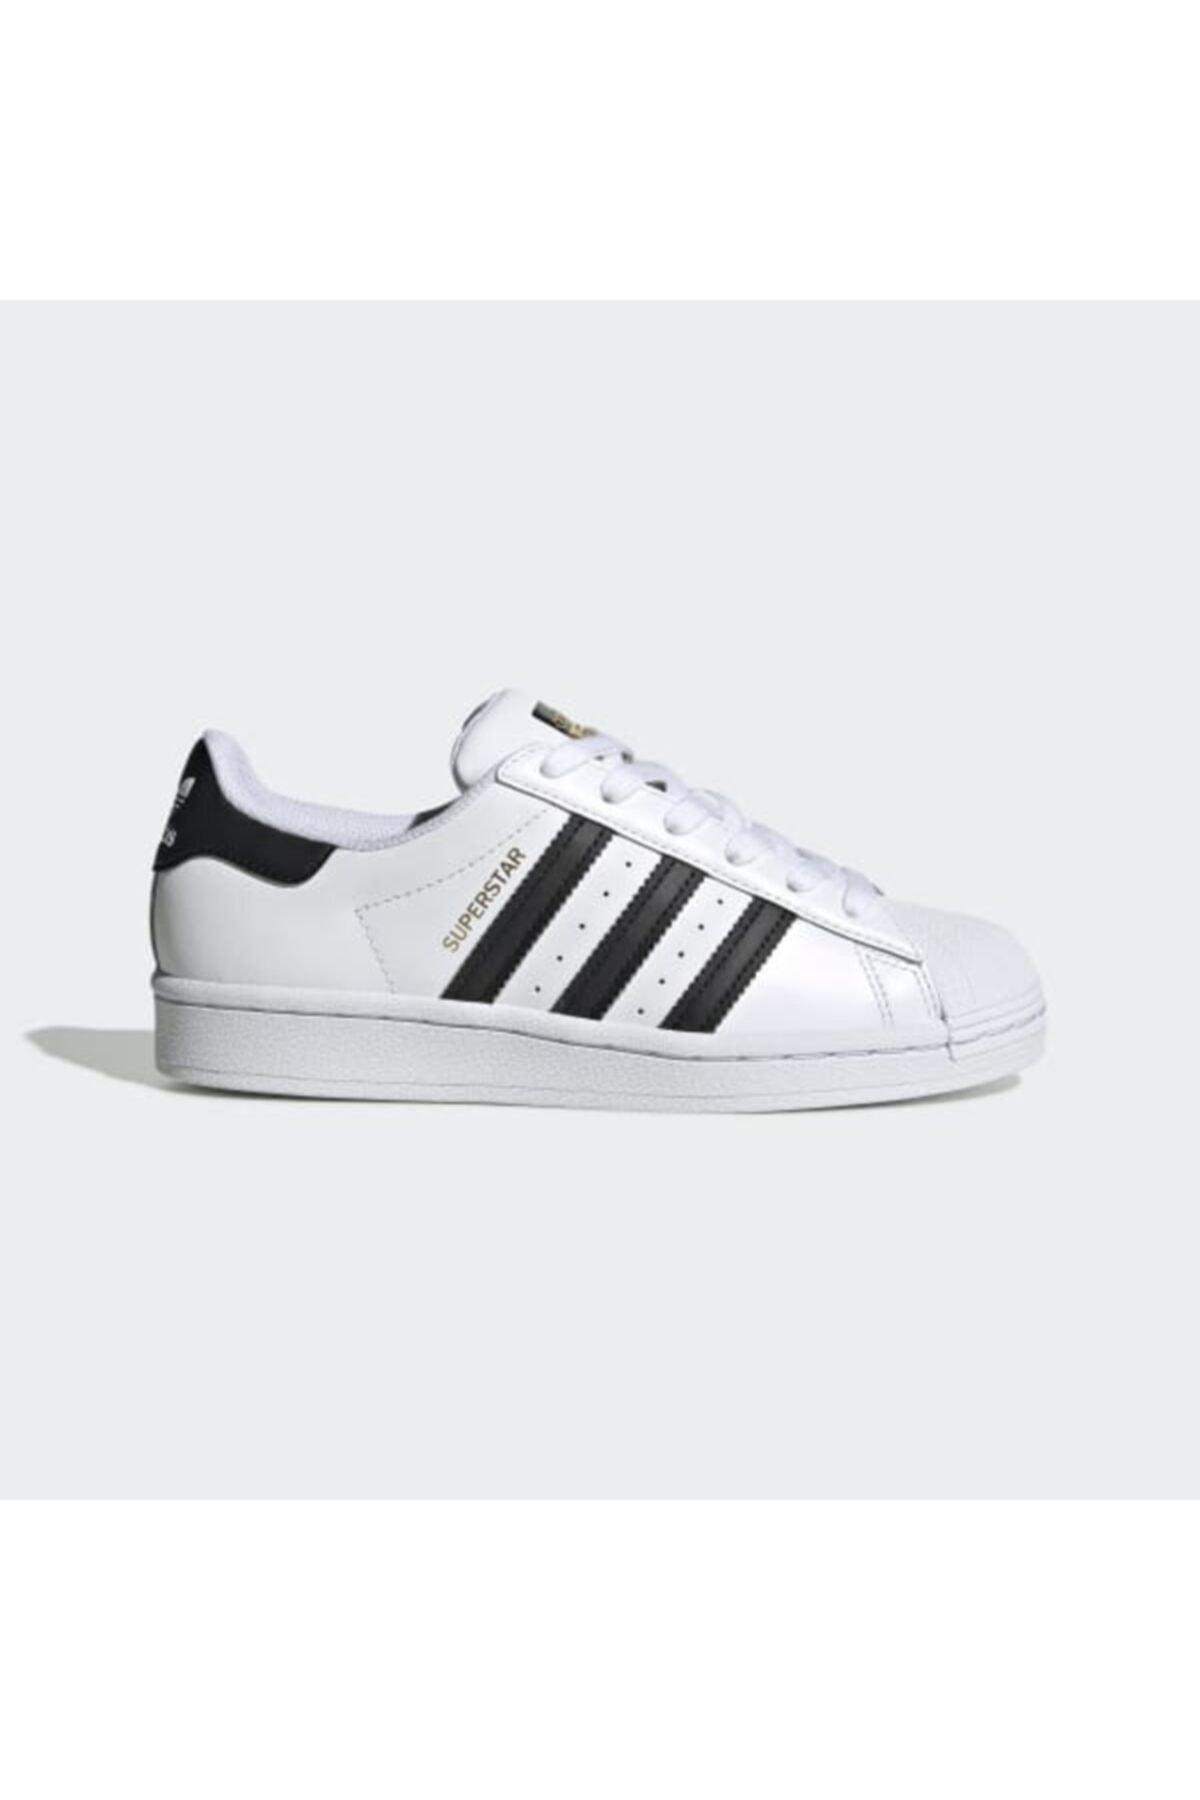 adidas Superstar (Gs) Spor Ayakkabı 1